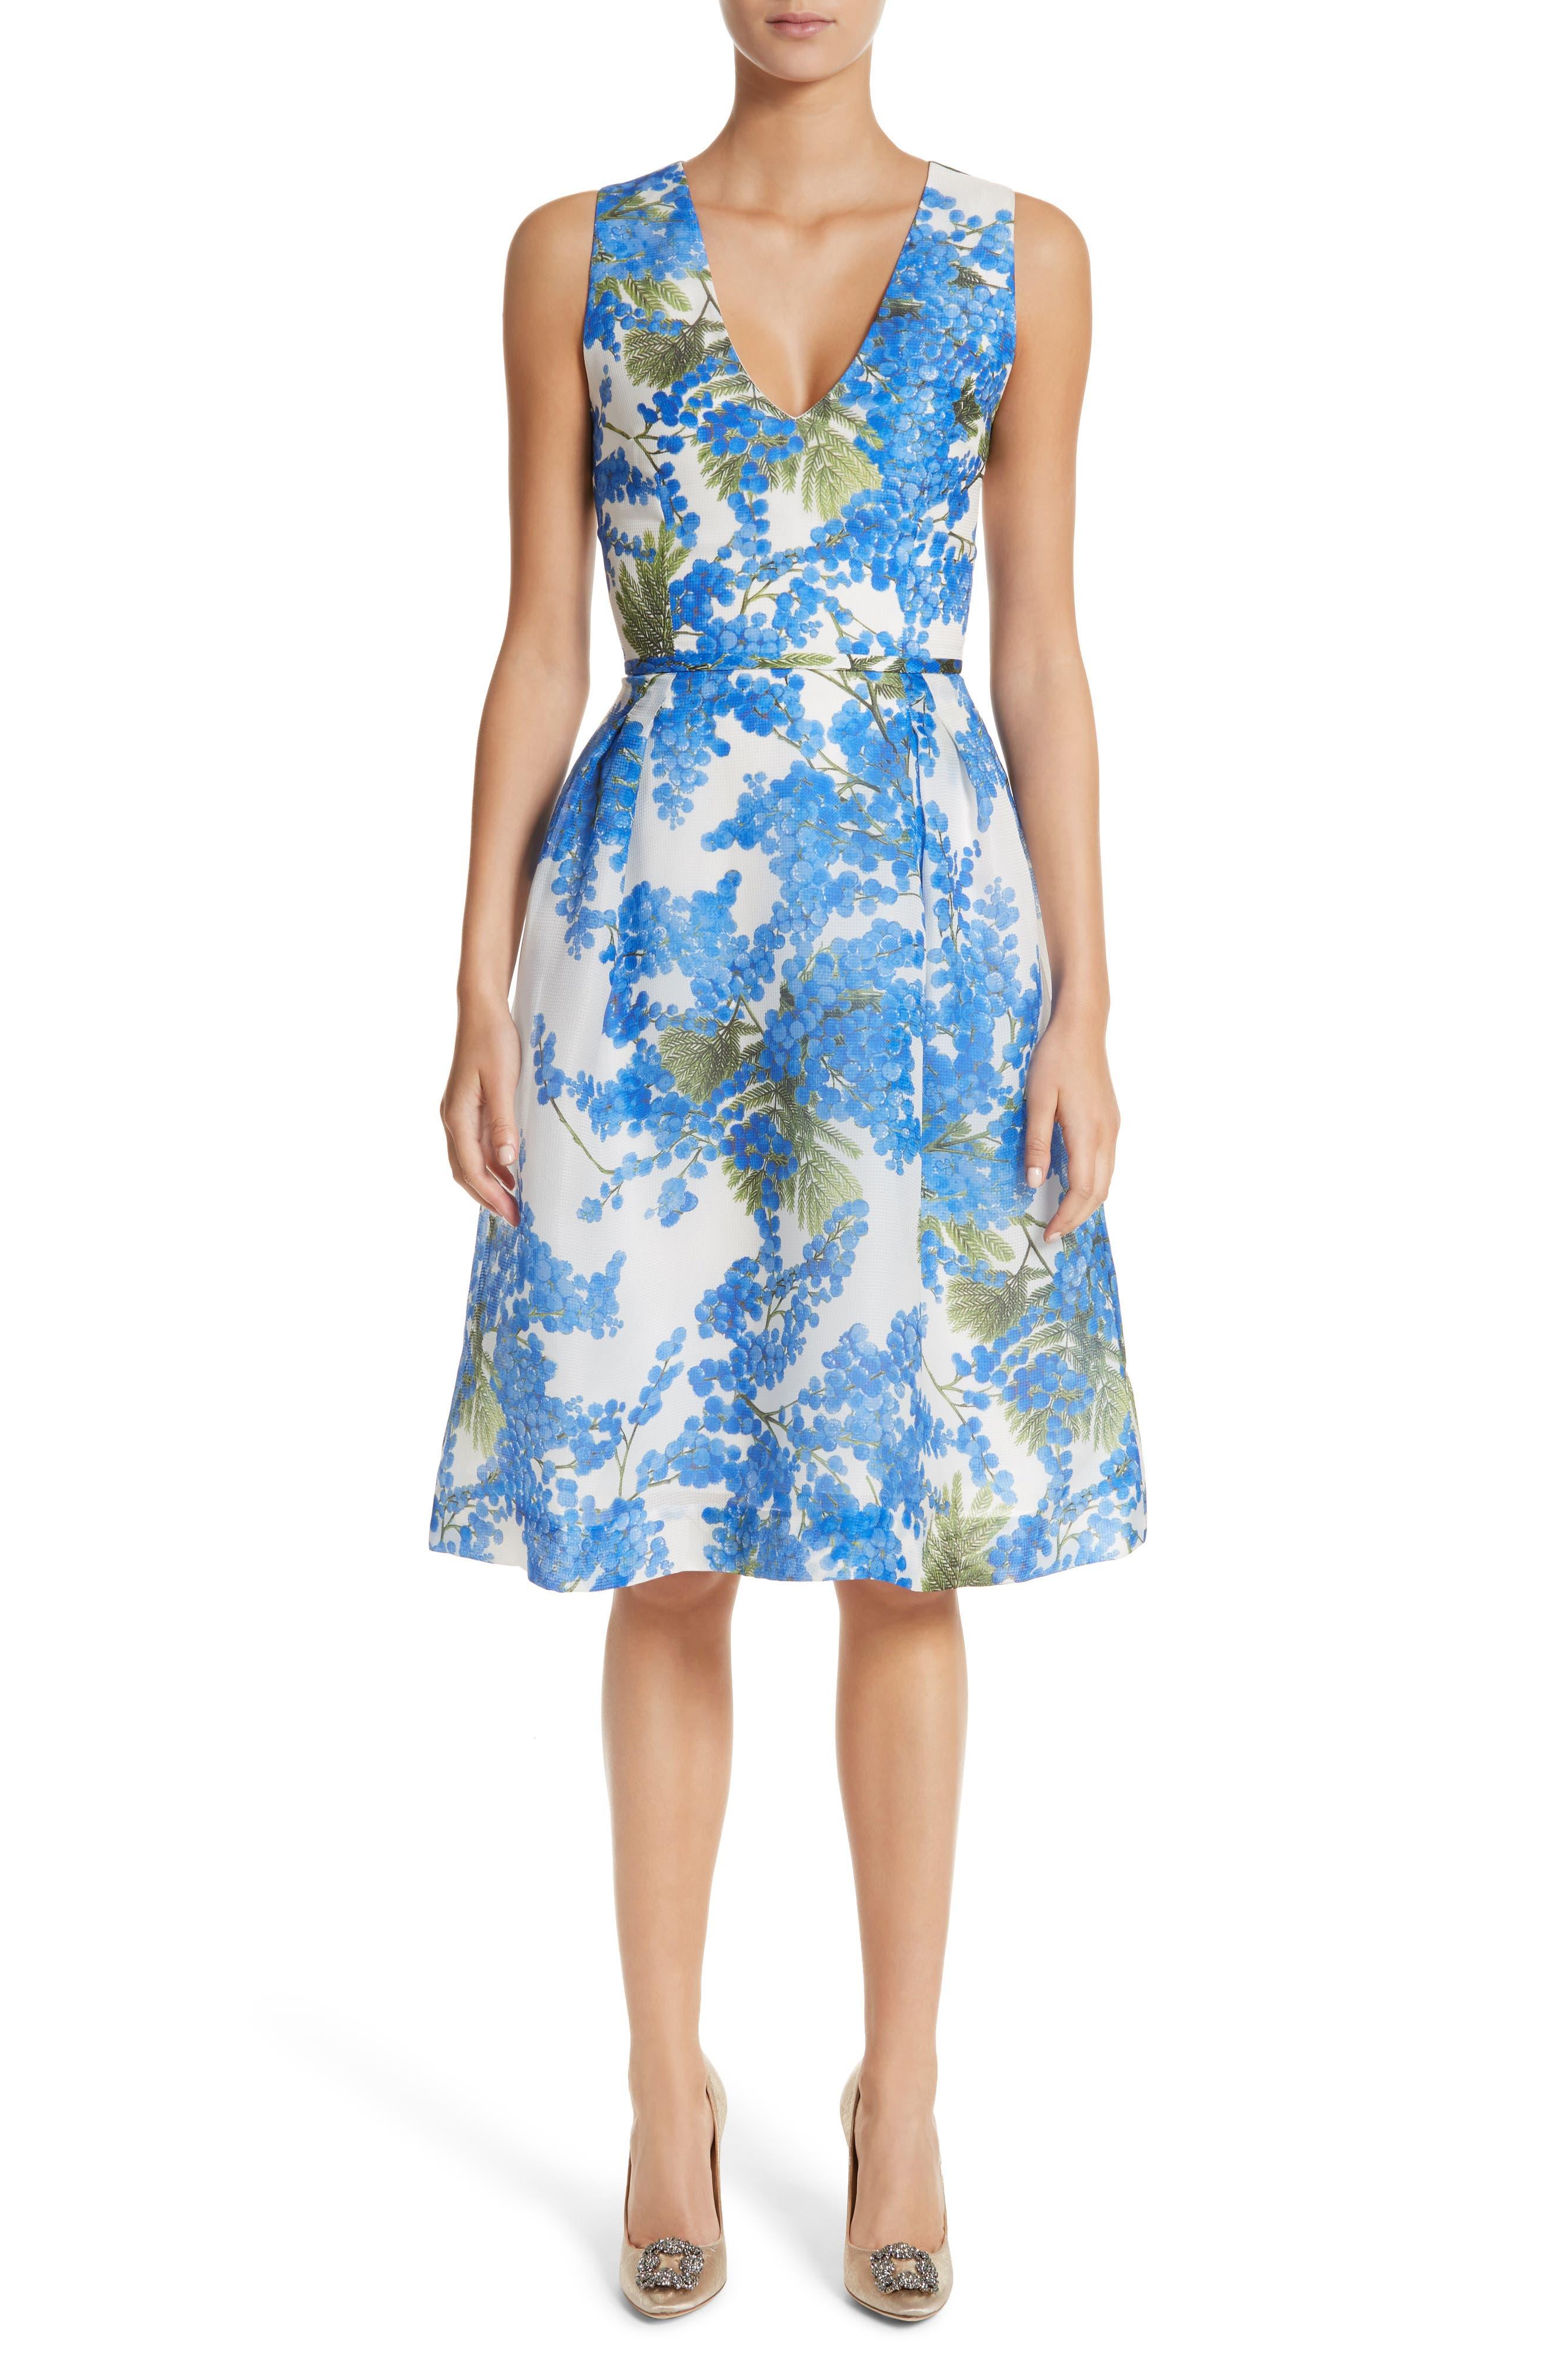 Alternate Image 1 Selected - Carolina Herrera Floral Fit & Flare Dress